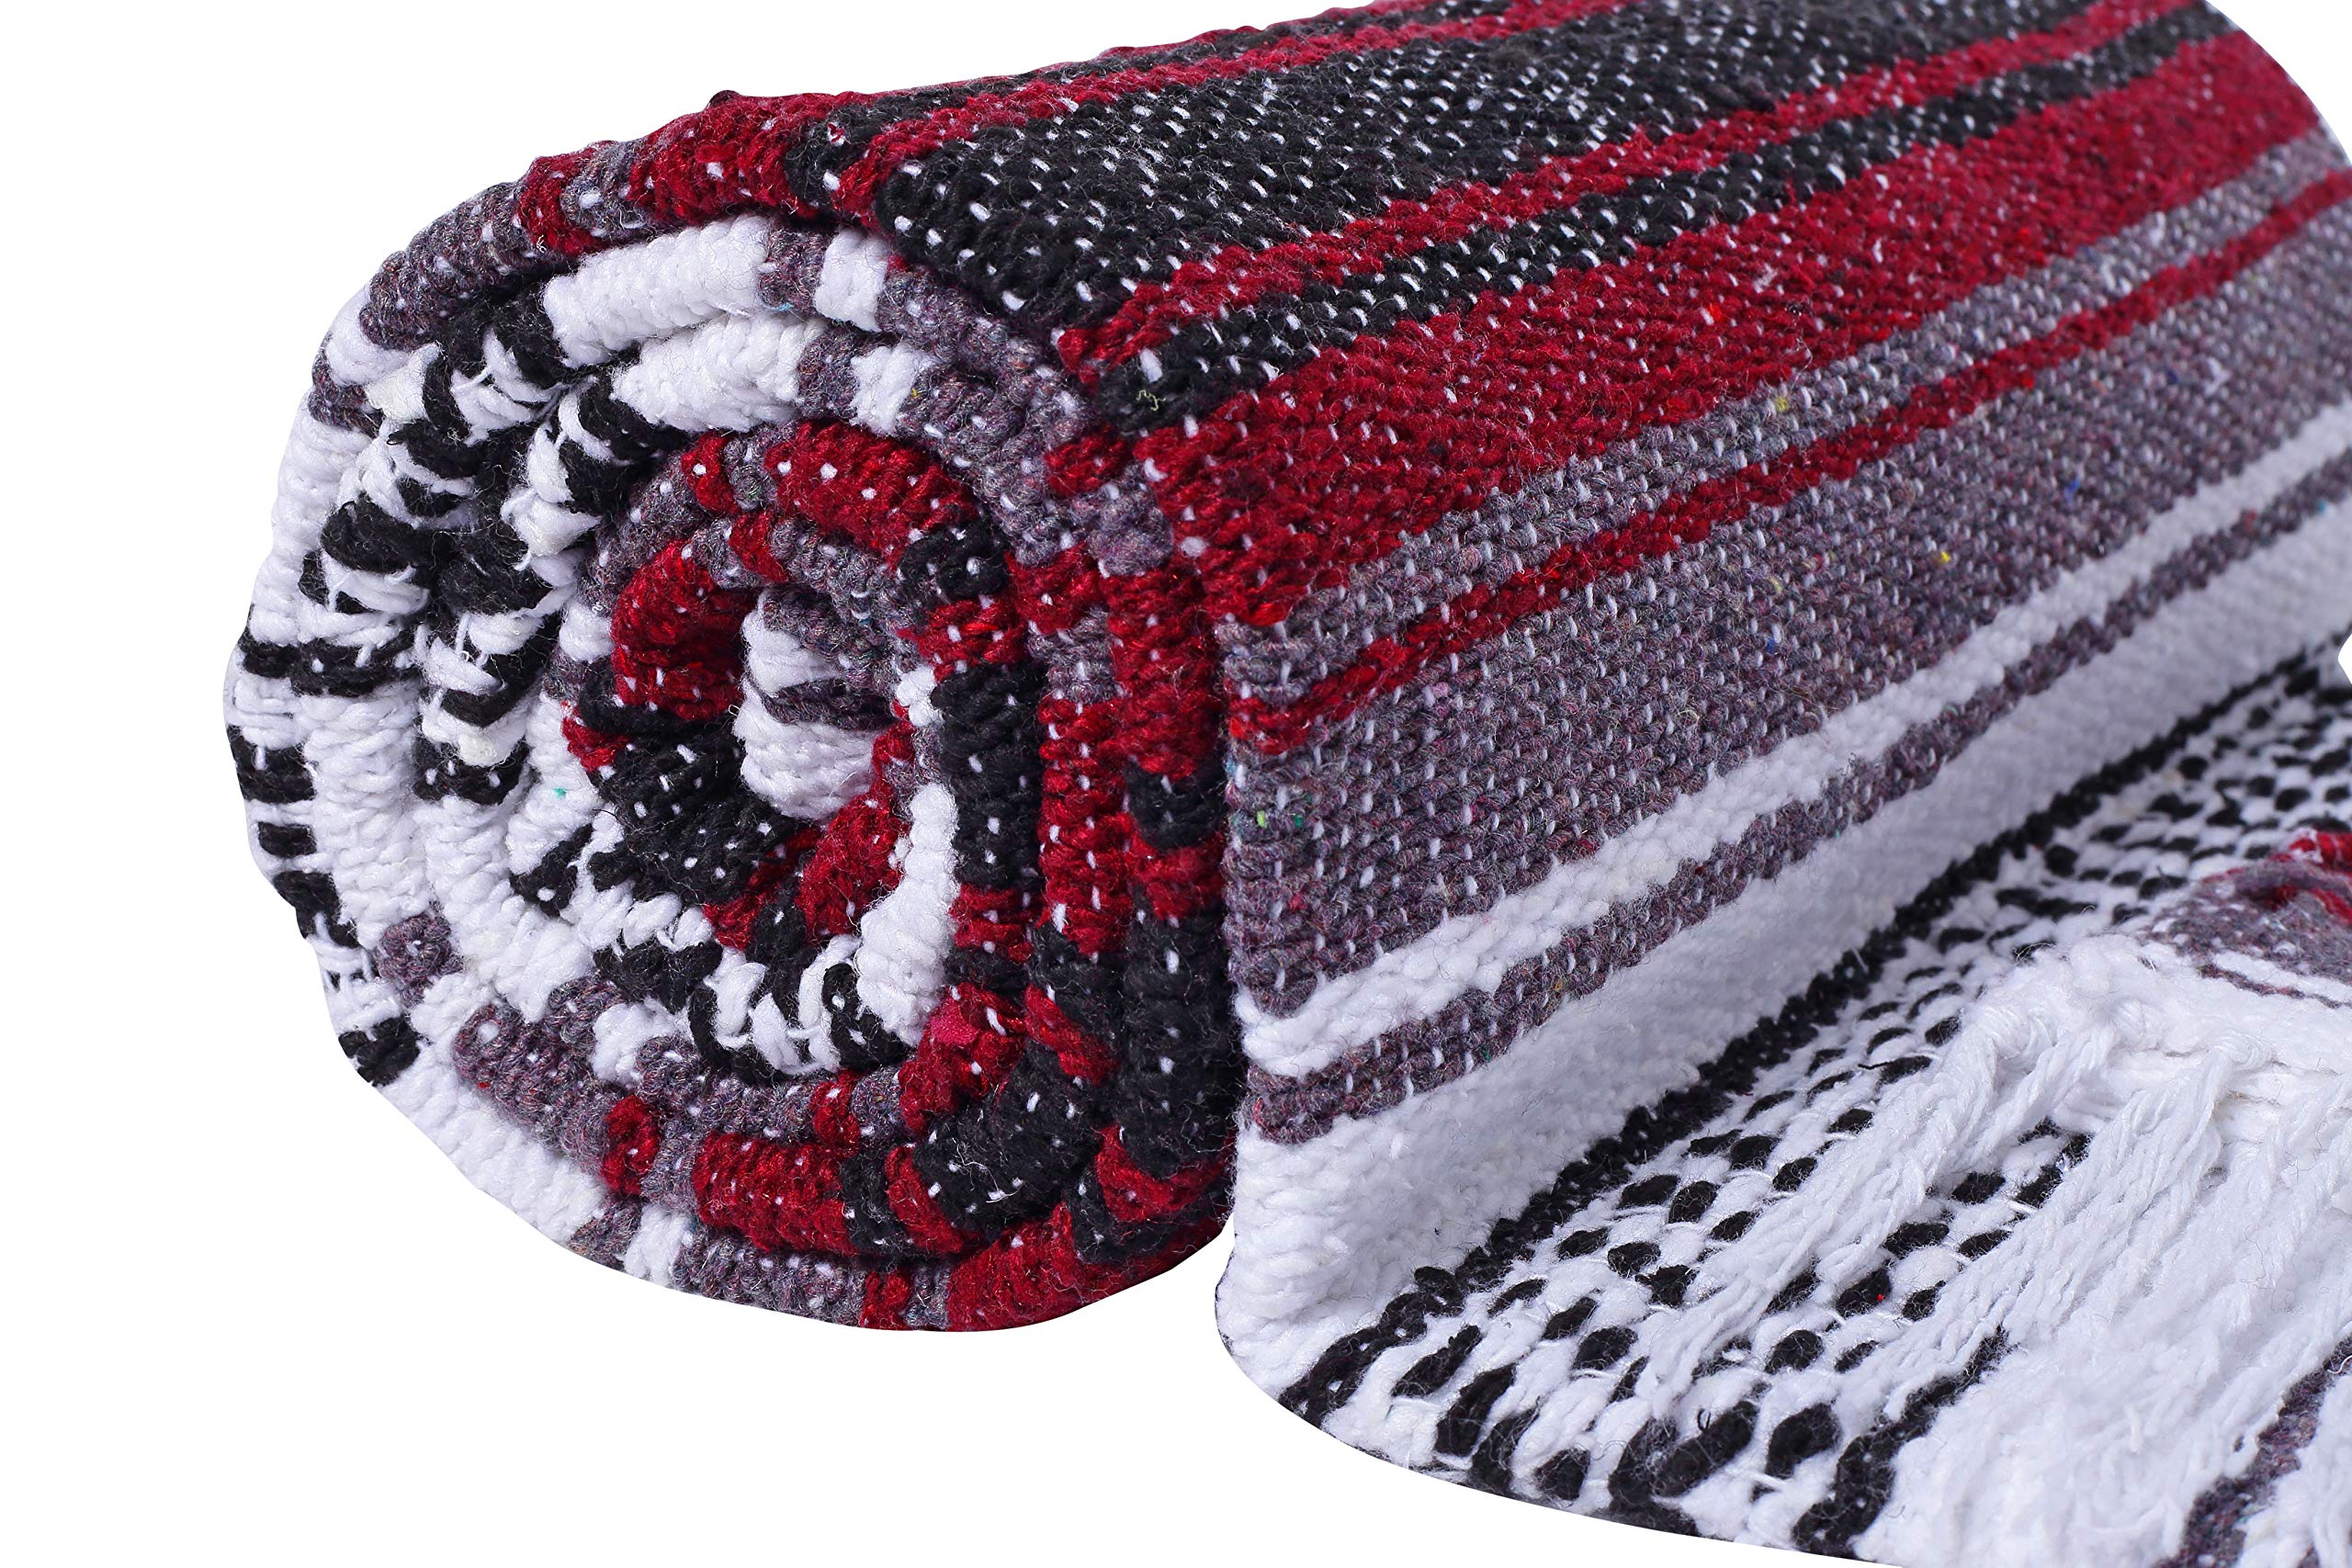 El Paso Designs Genuine Mexican Falsa Blanket - Yoga Studio Blanket, Colorful, Soft Woven Serape Imported from Mexico (Burgundy) by El Paso Designs (Image #6)